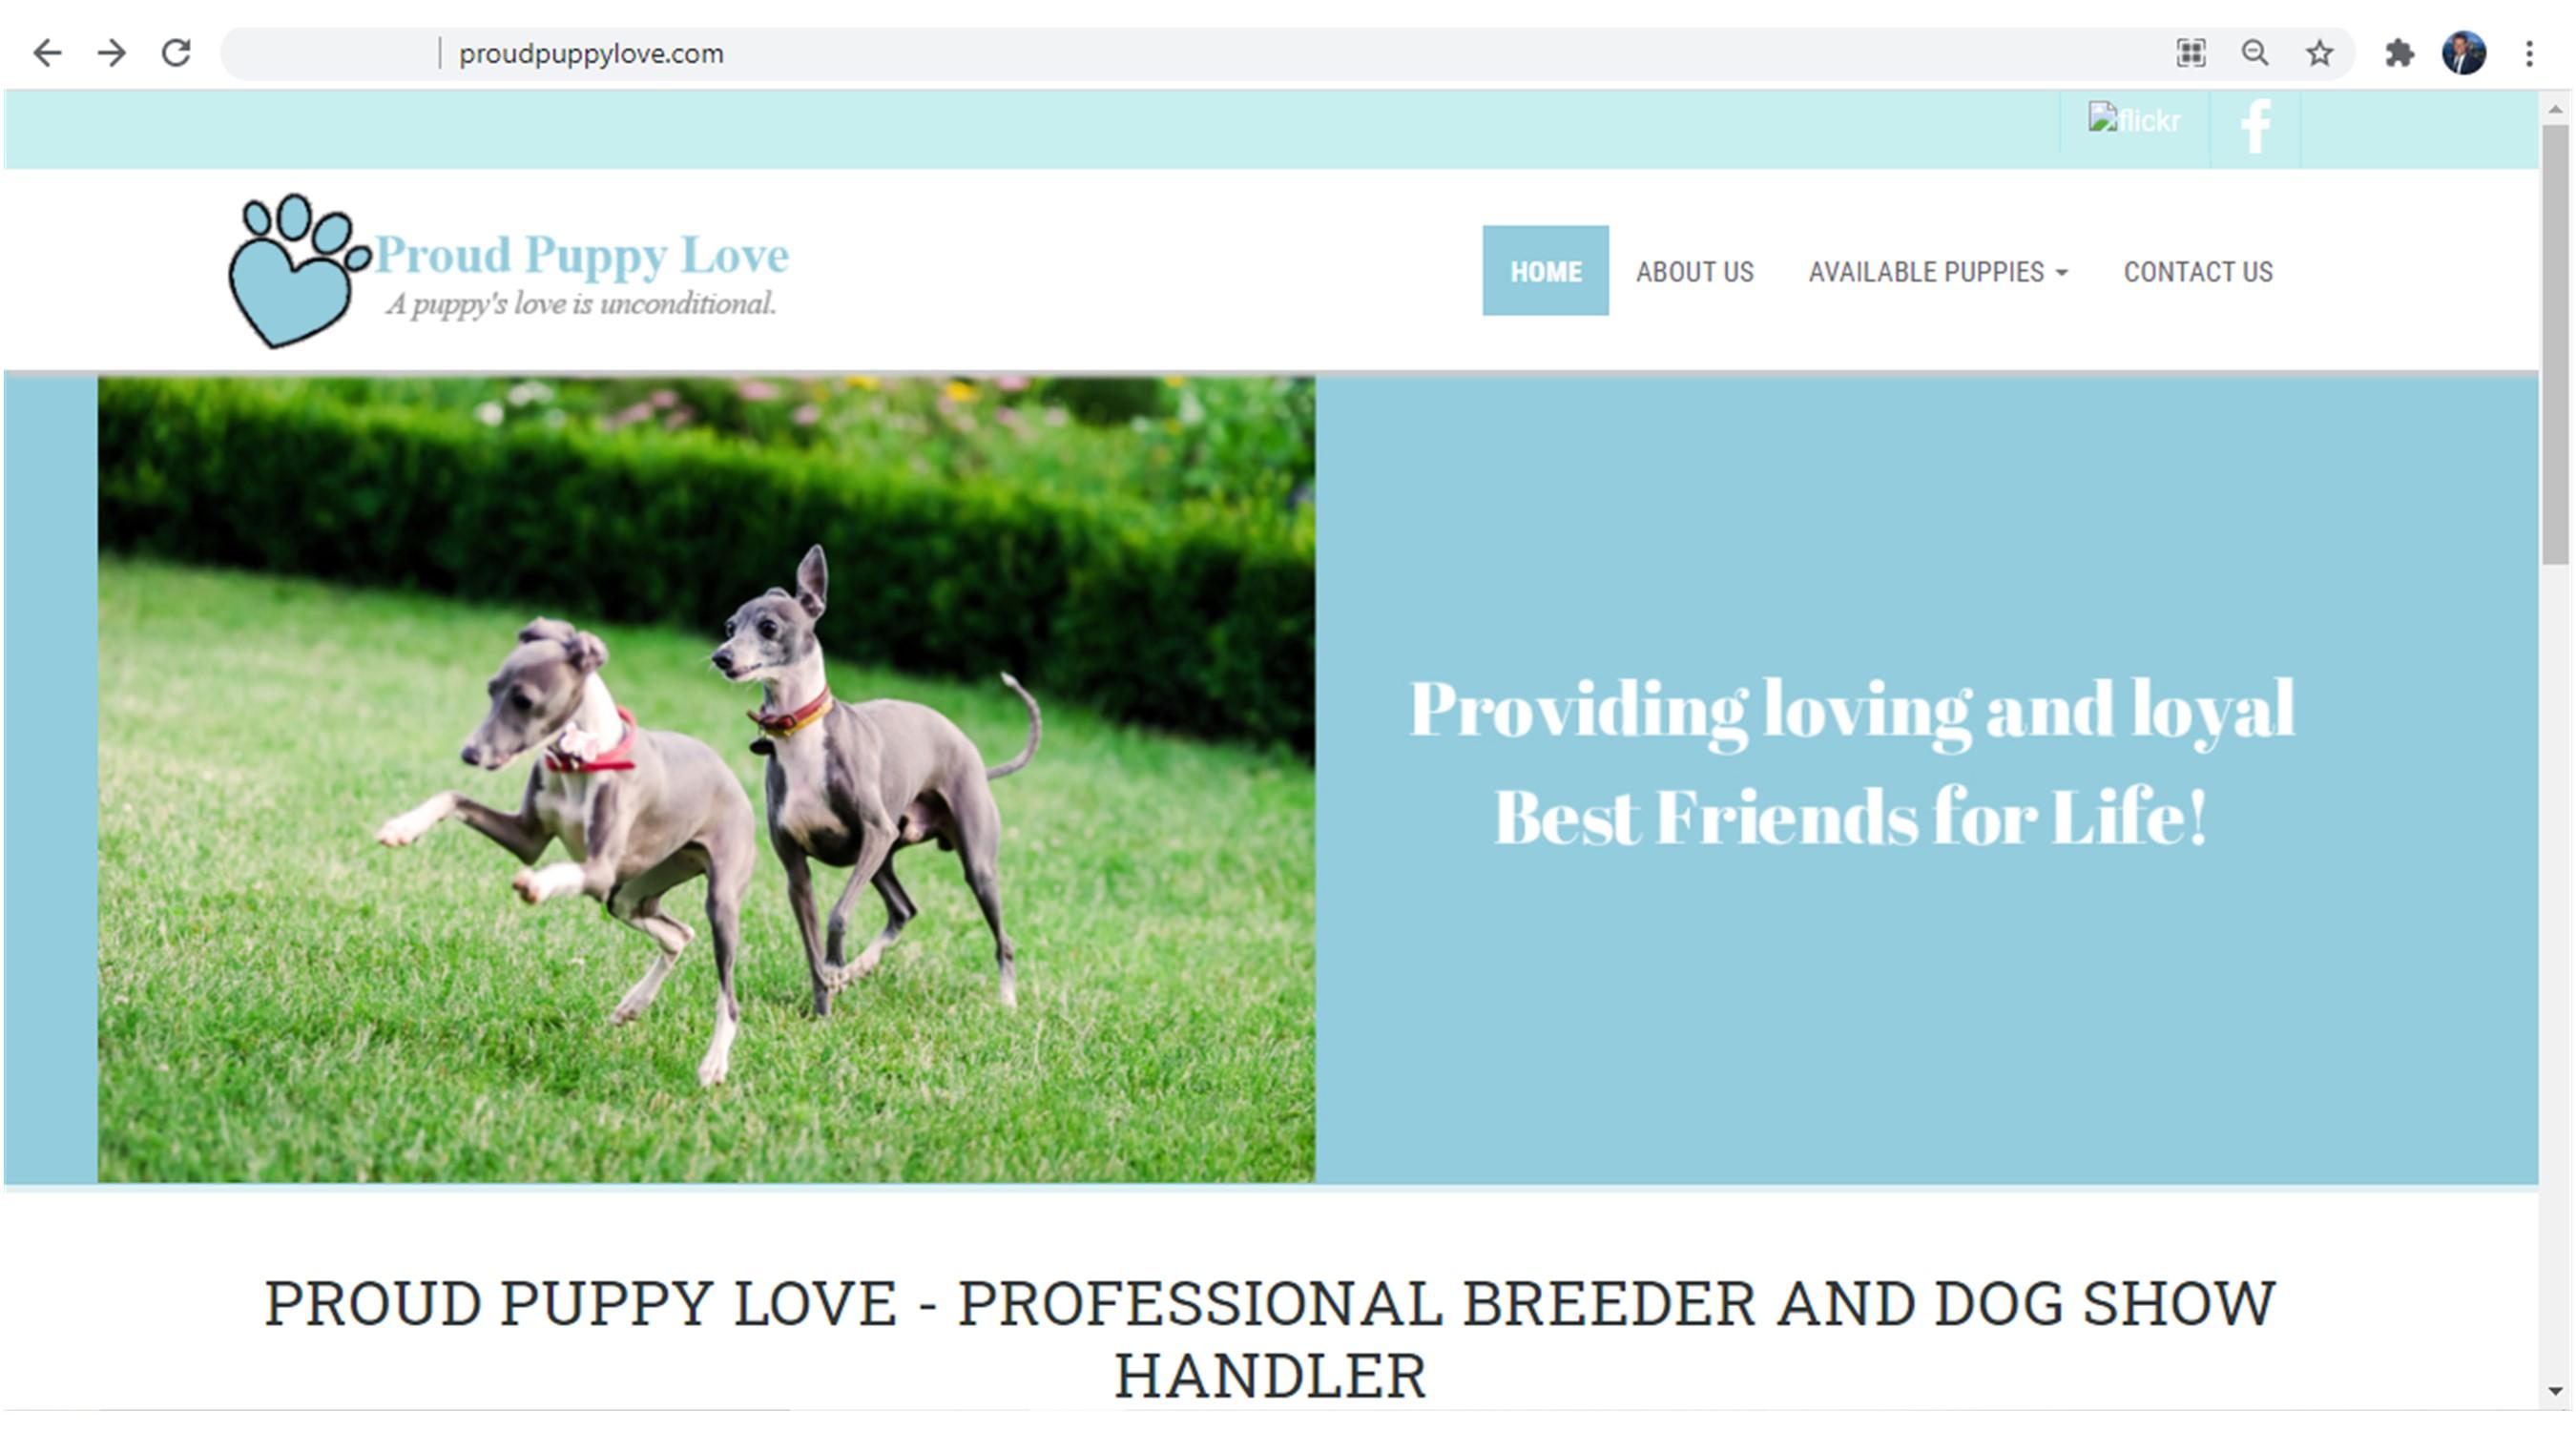 kim, dildine, dog, breeder, homepage, kim-dildine, kim dildine breeder, starbreeder, dog-breeder, willow, springs, mo, missouri, aphis, inspection, record, grey, hound, greyhound, puppy, mill, pu